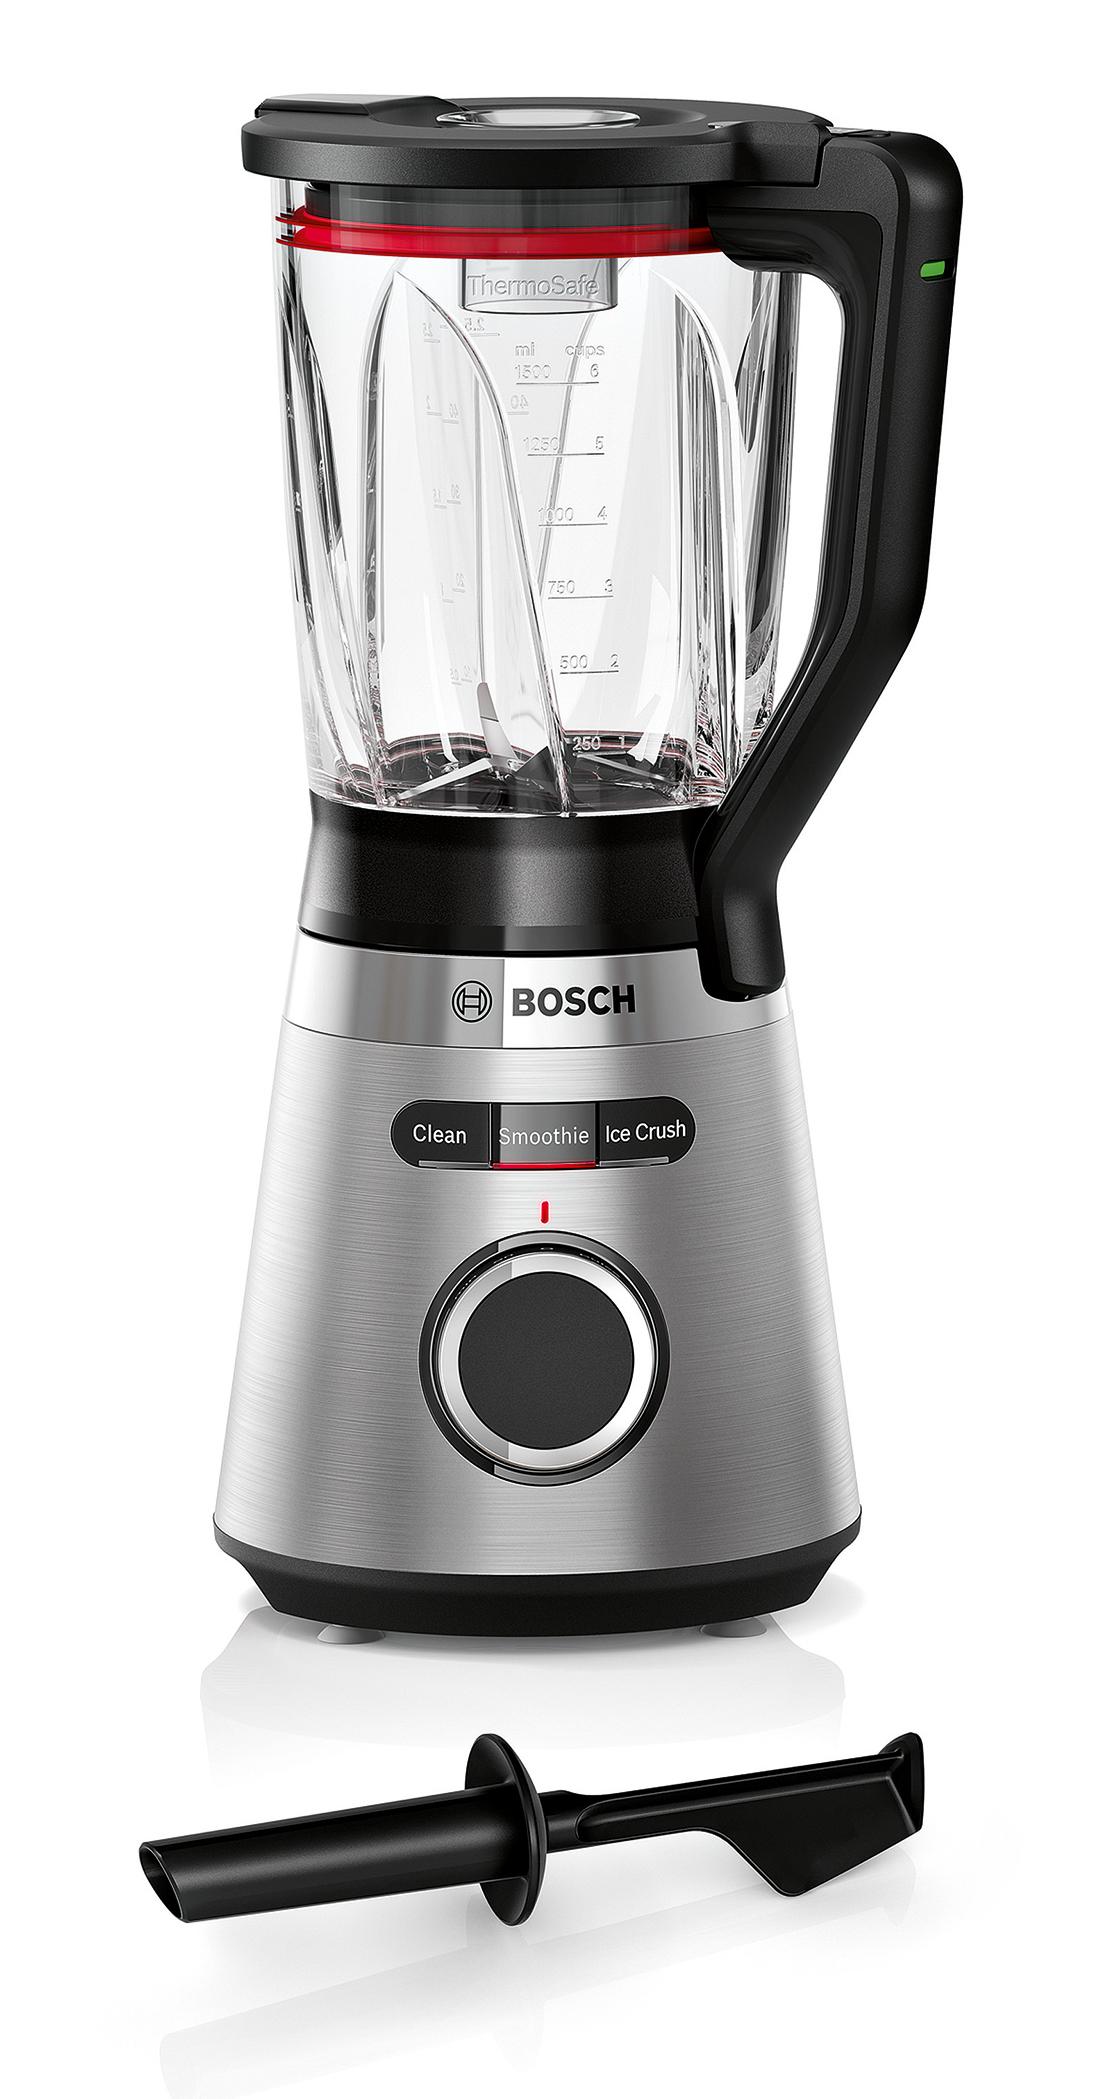 <h1>Bosch Mixer VitaPower Serie I 4</h1><h3 style='font-size: 20px; margin: 0px 0px 15px 0px;'>Standmixer, EasyKlick-Messer, Edelstahlgehäuse, Automatik-Programme</h3>